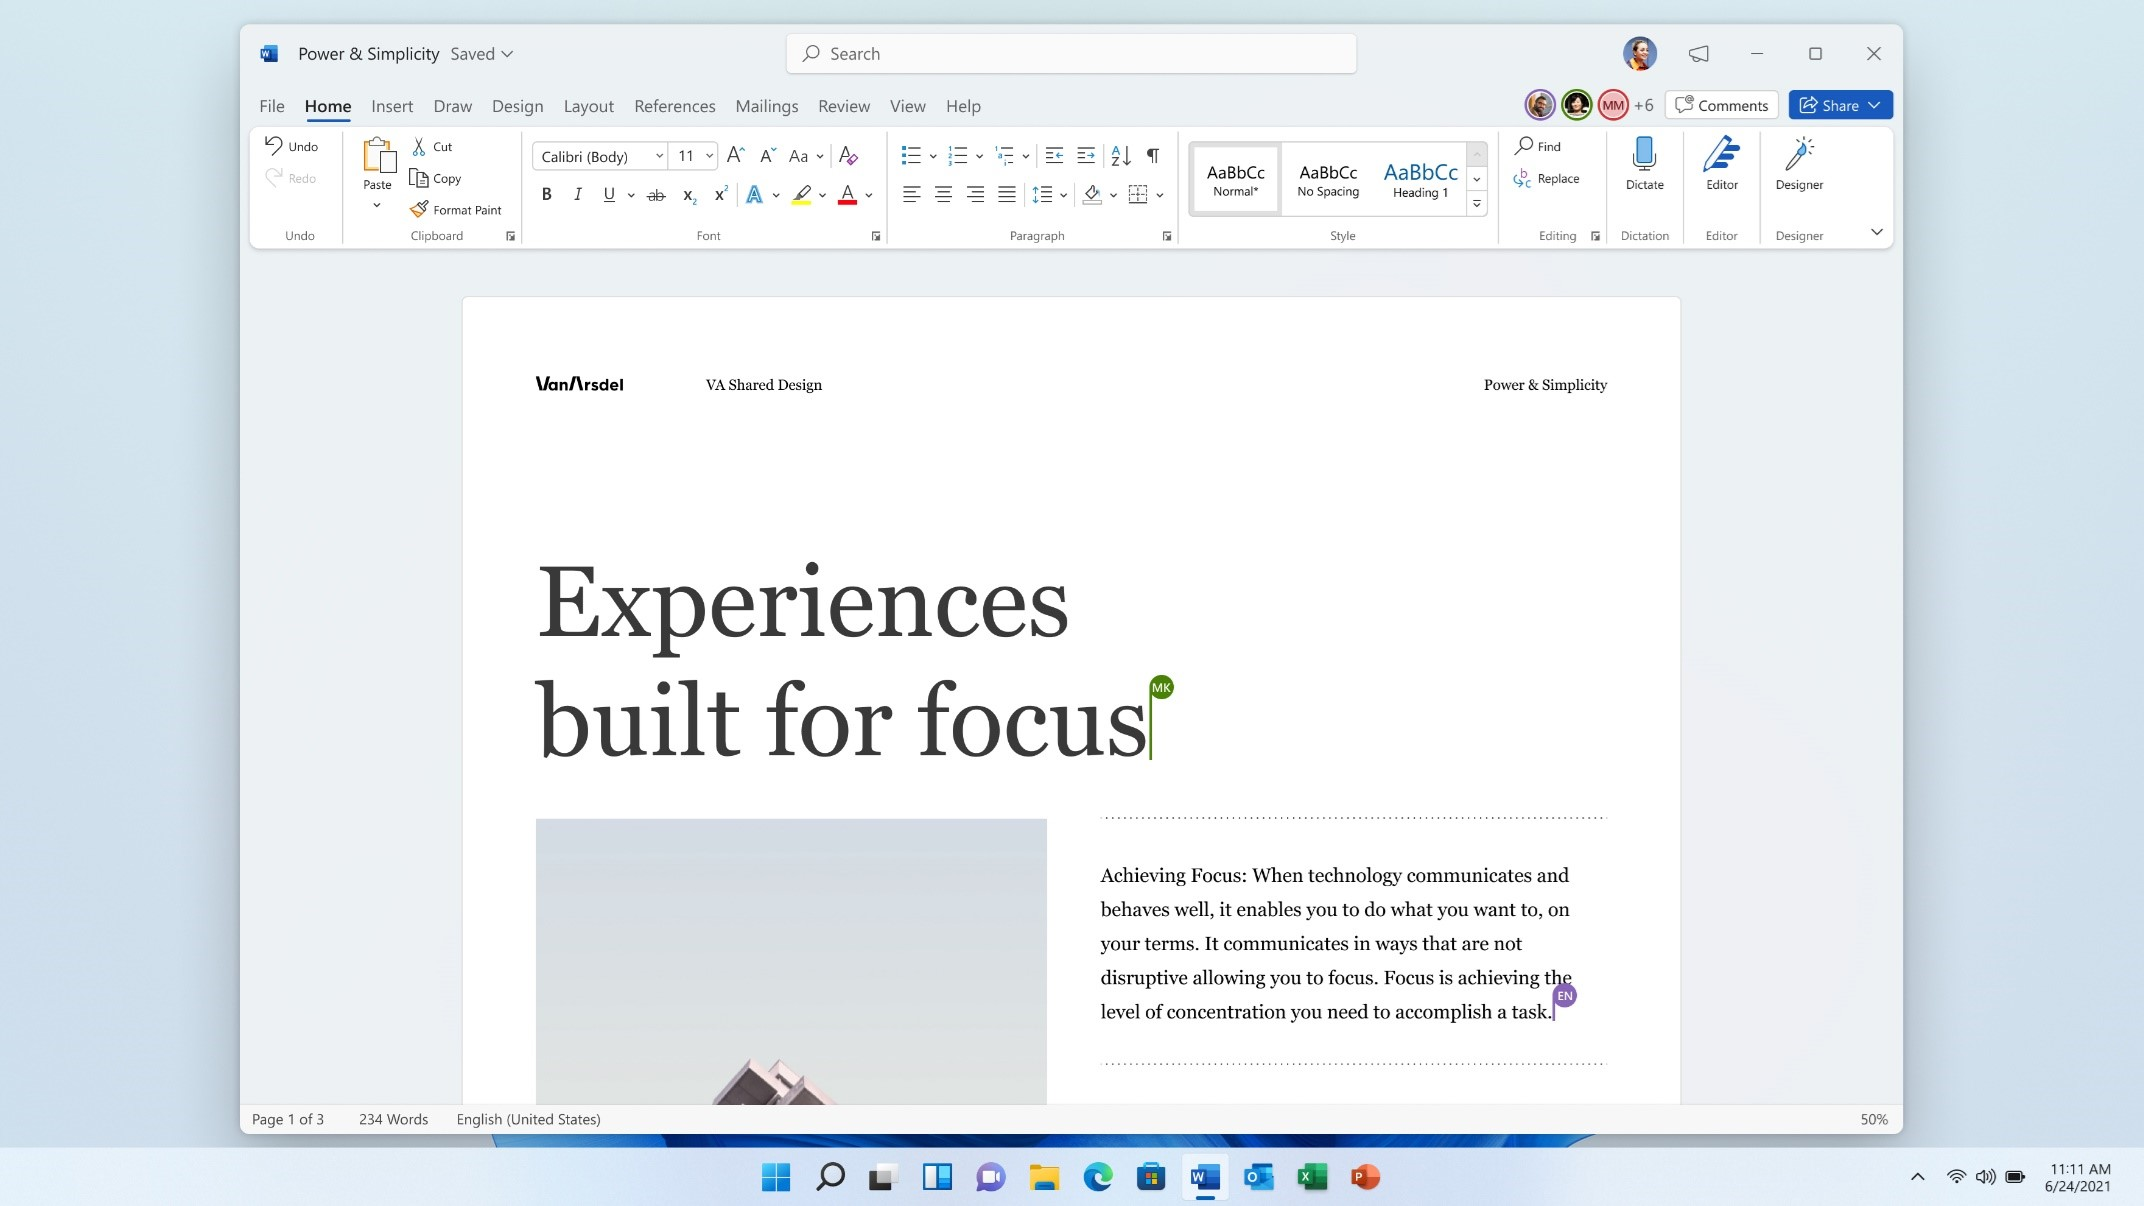 microsoft office 2021 word